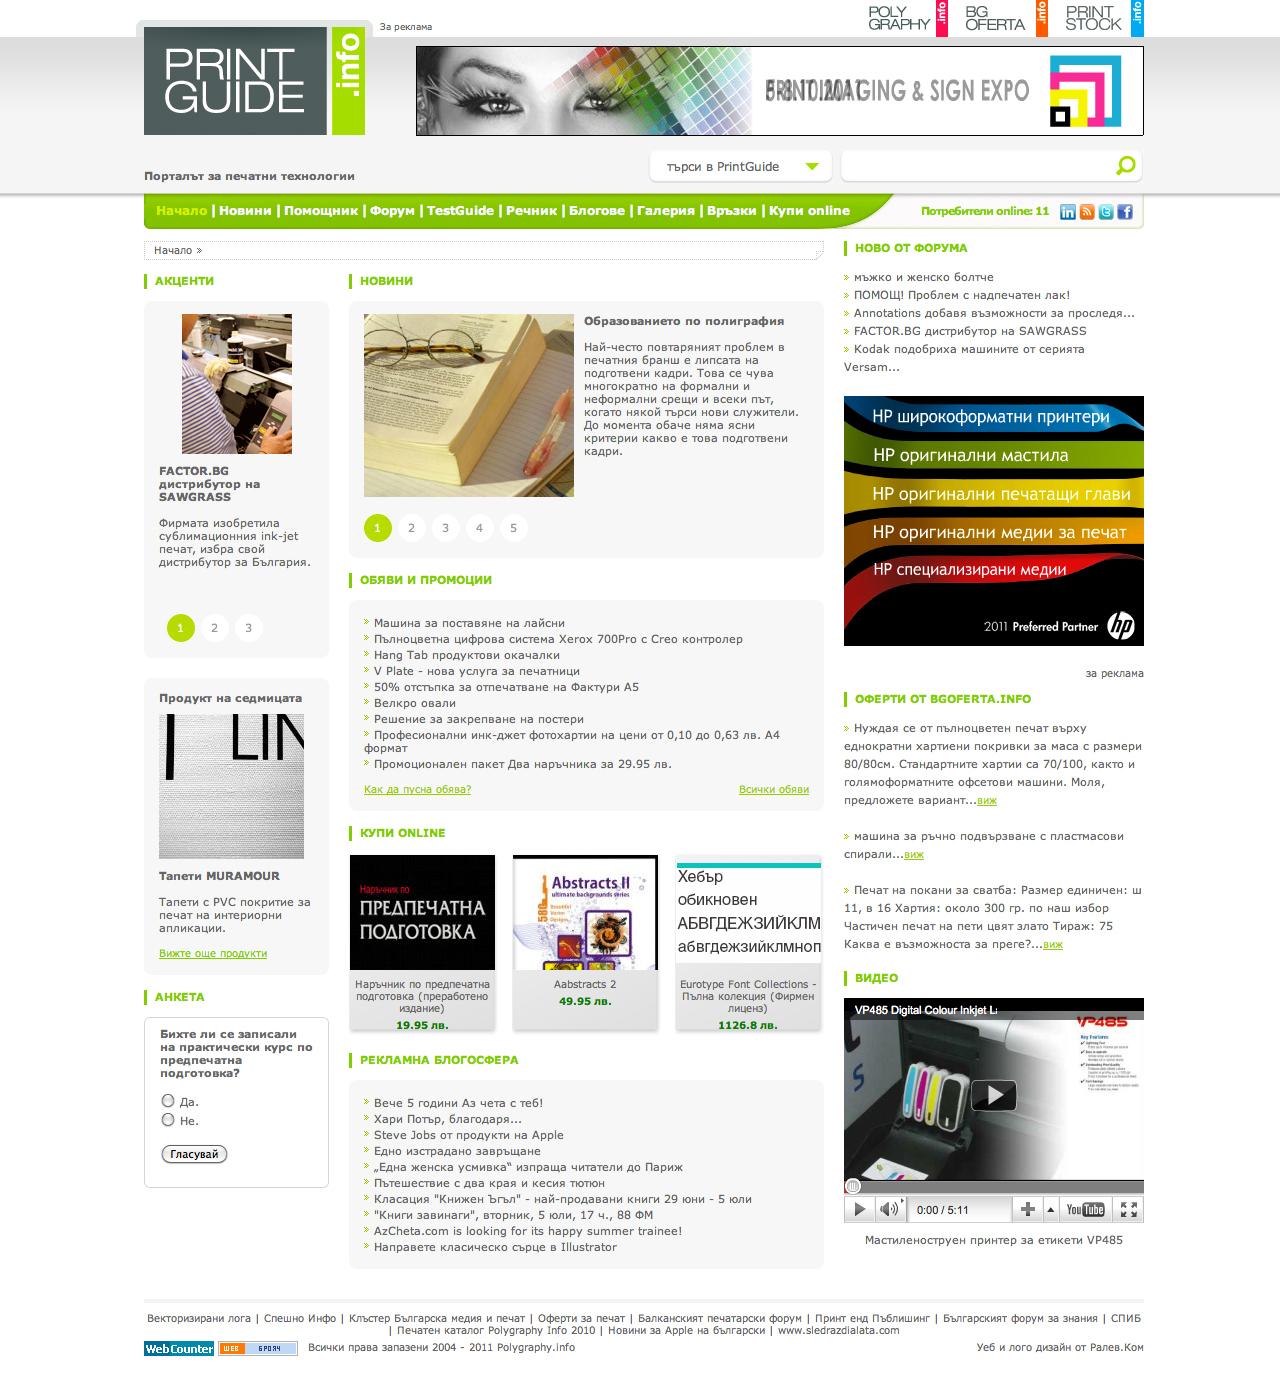 rebranding on the web